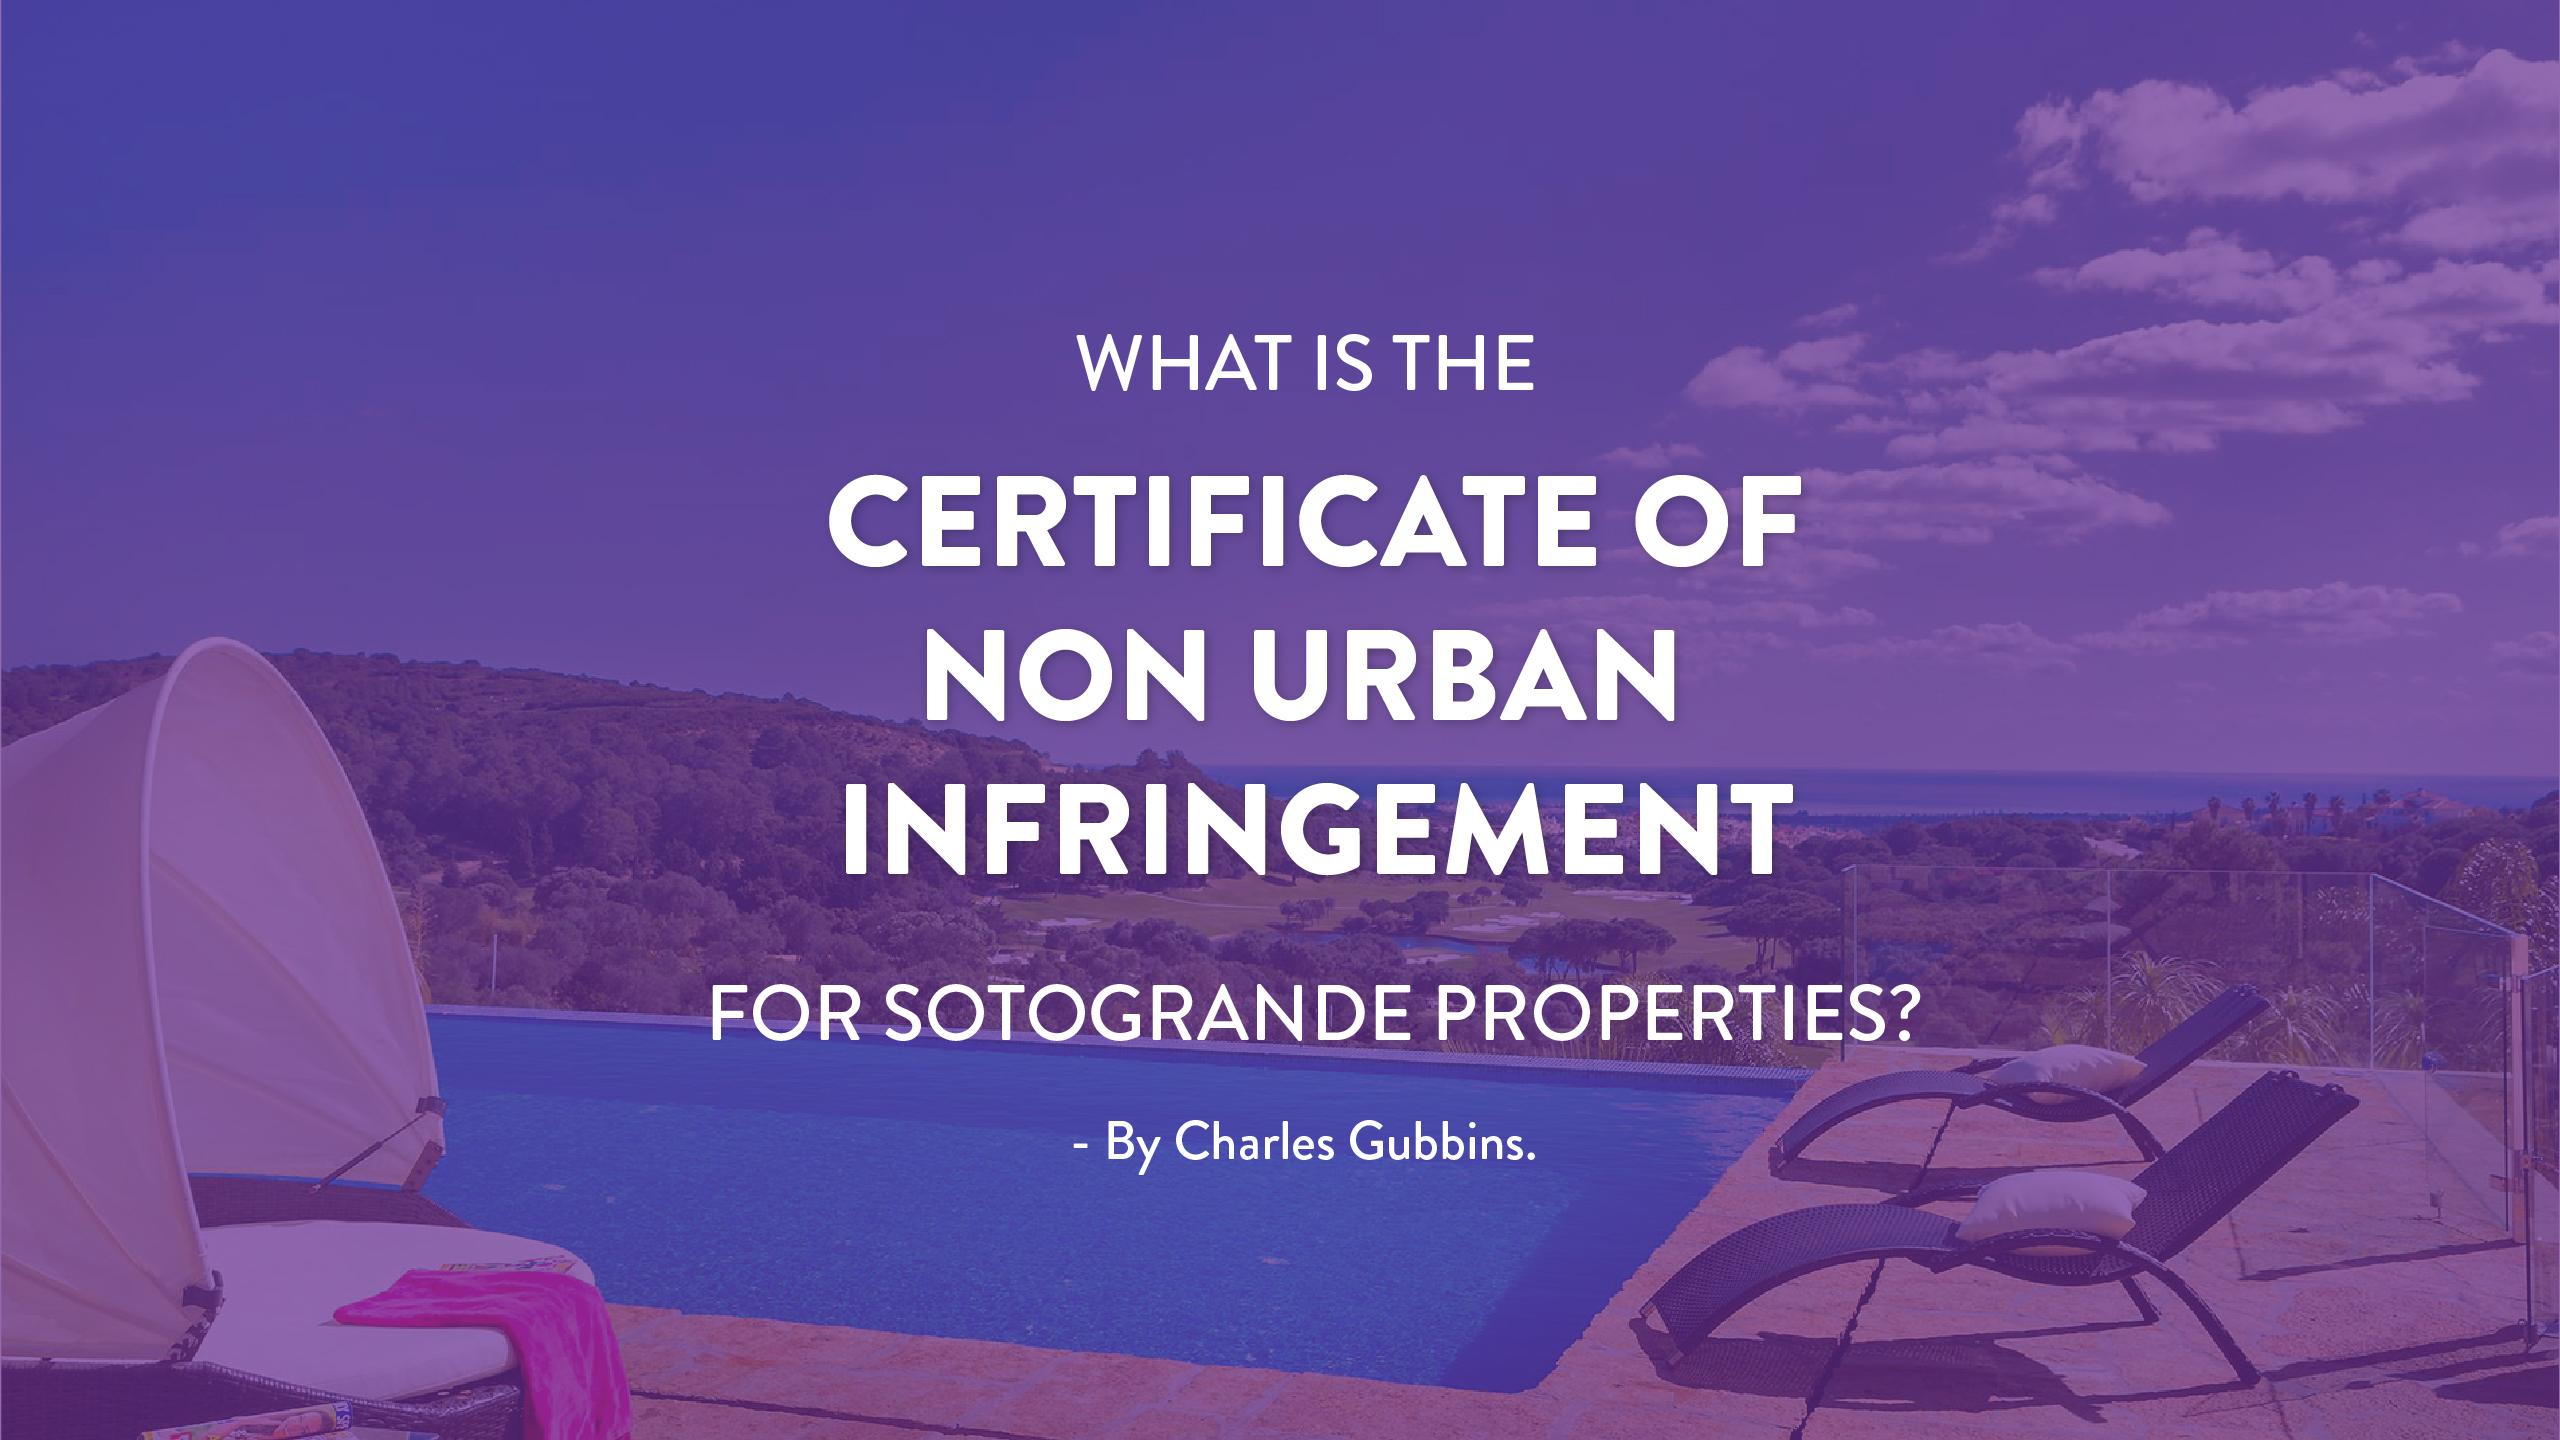 certificate-of-non-urban-infringement-cnui-sotogrande